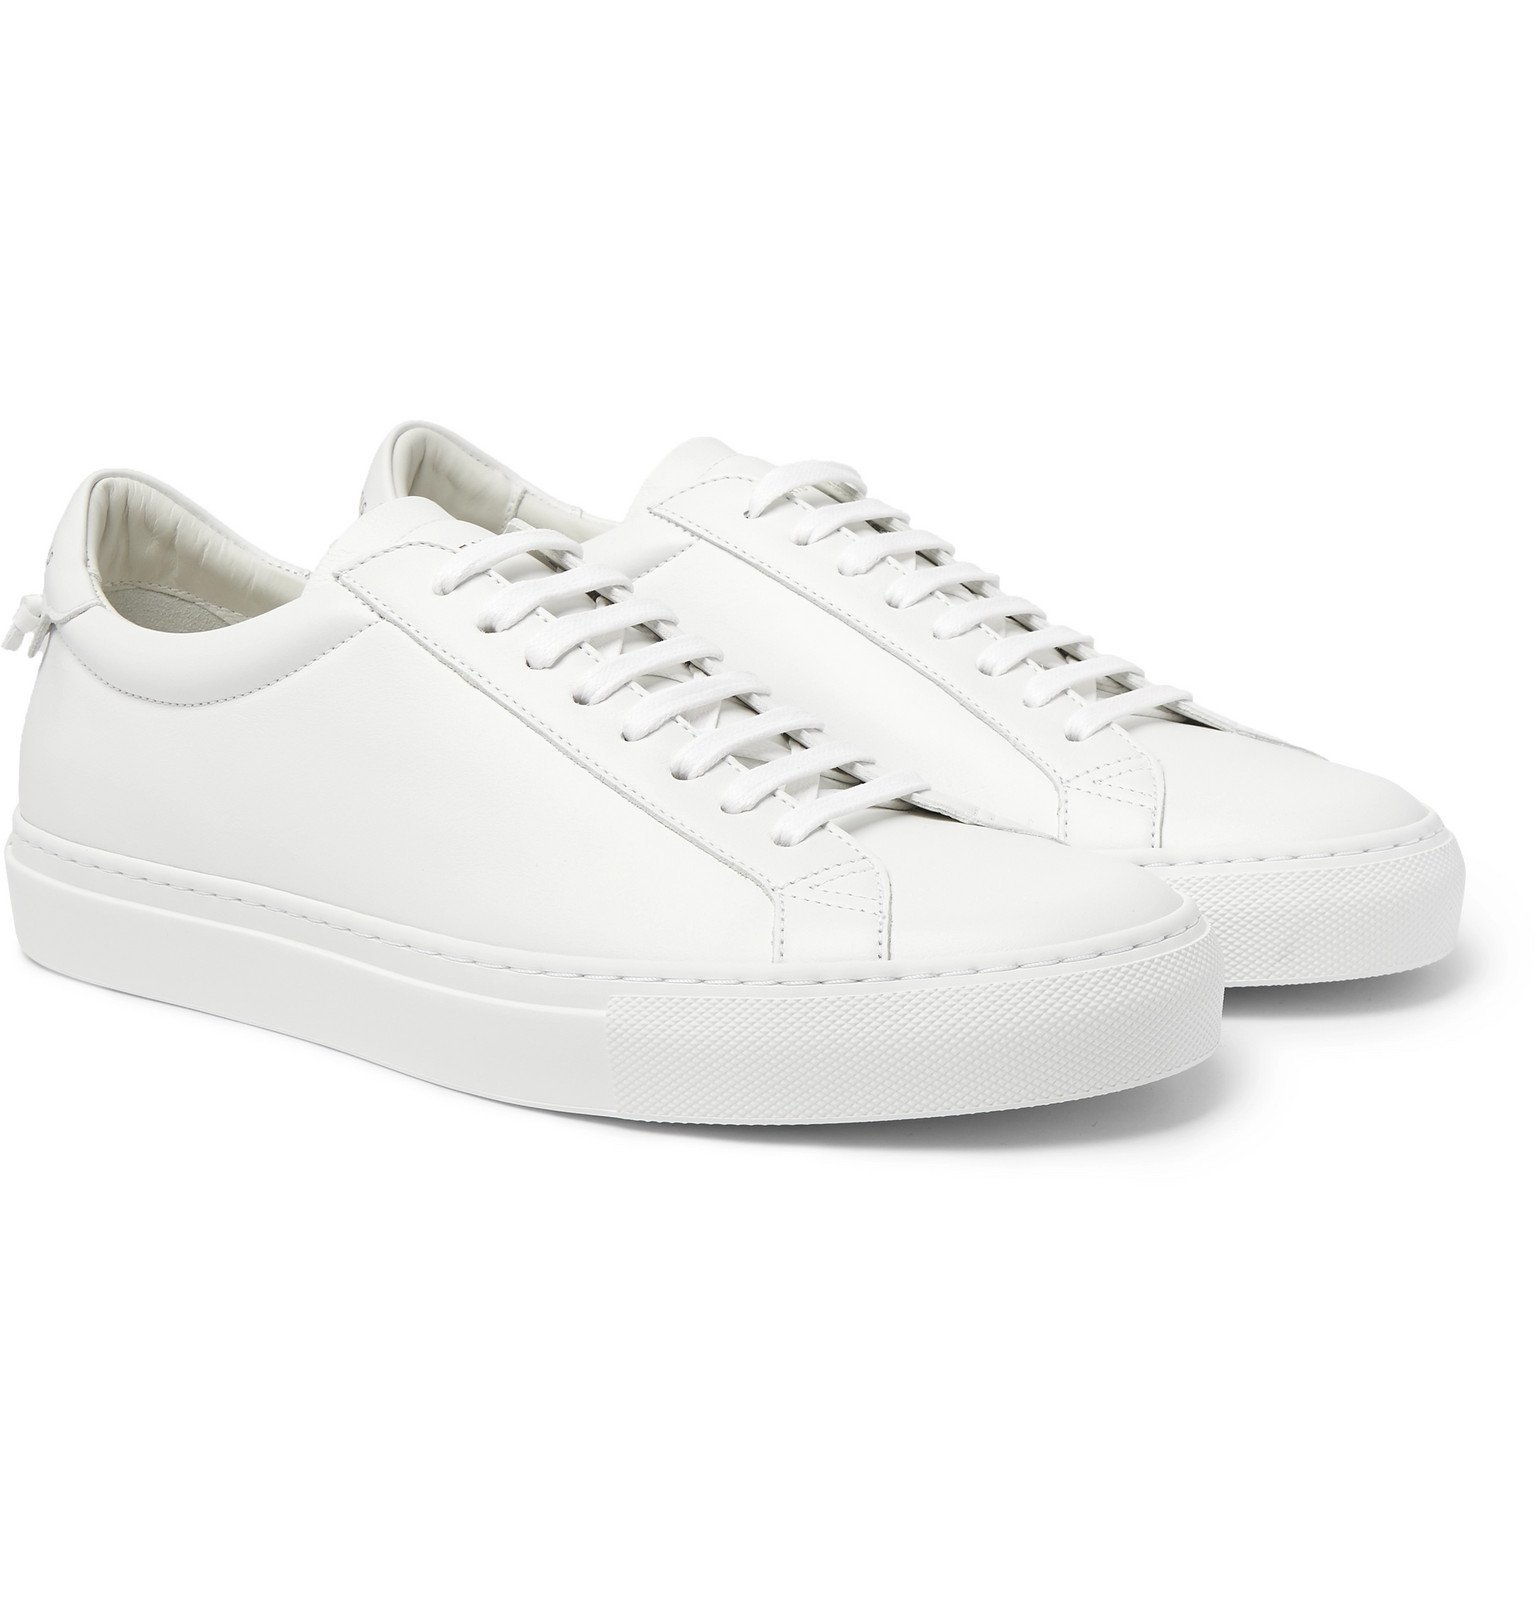 givenchy urban street sneakers white